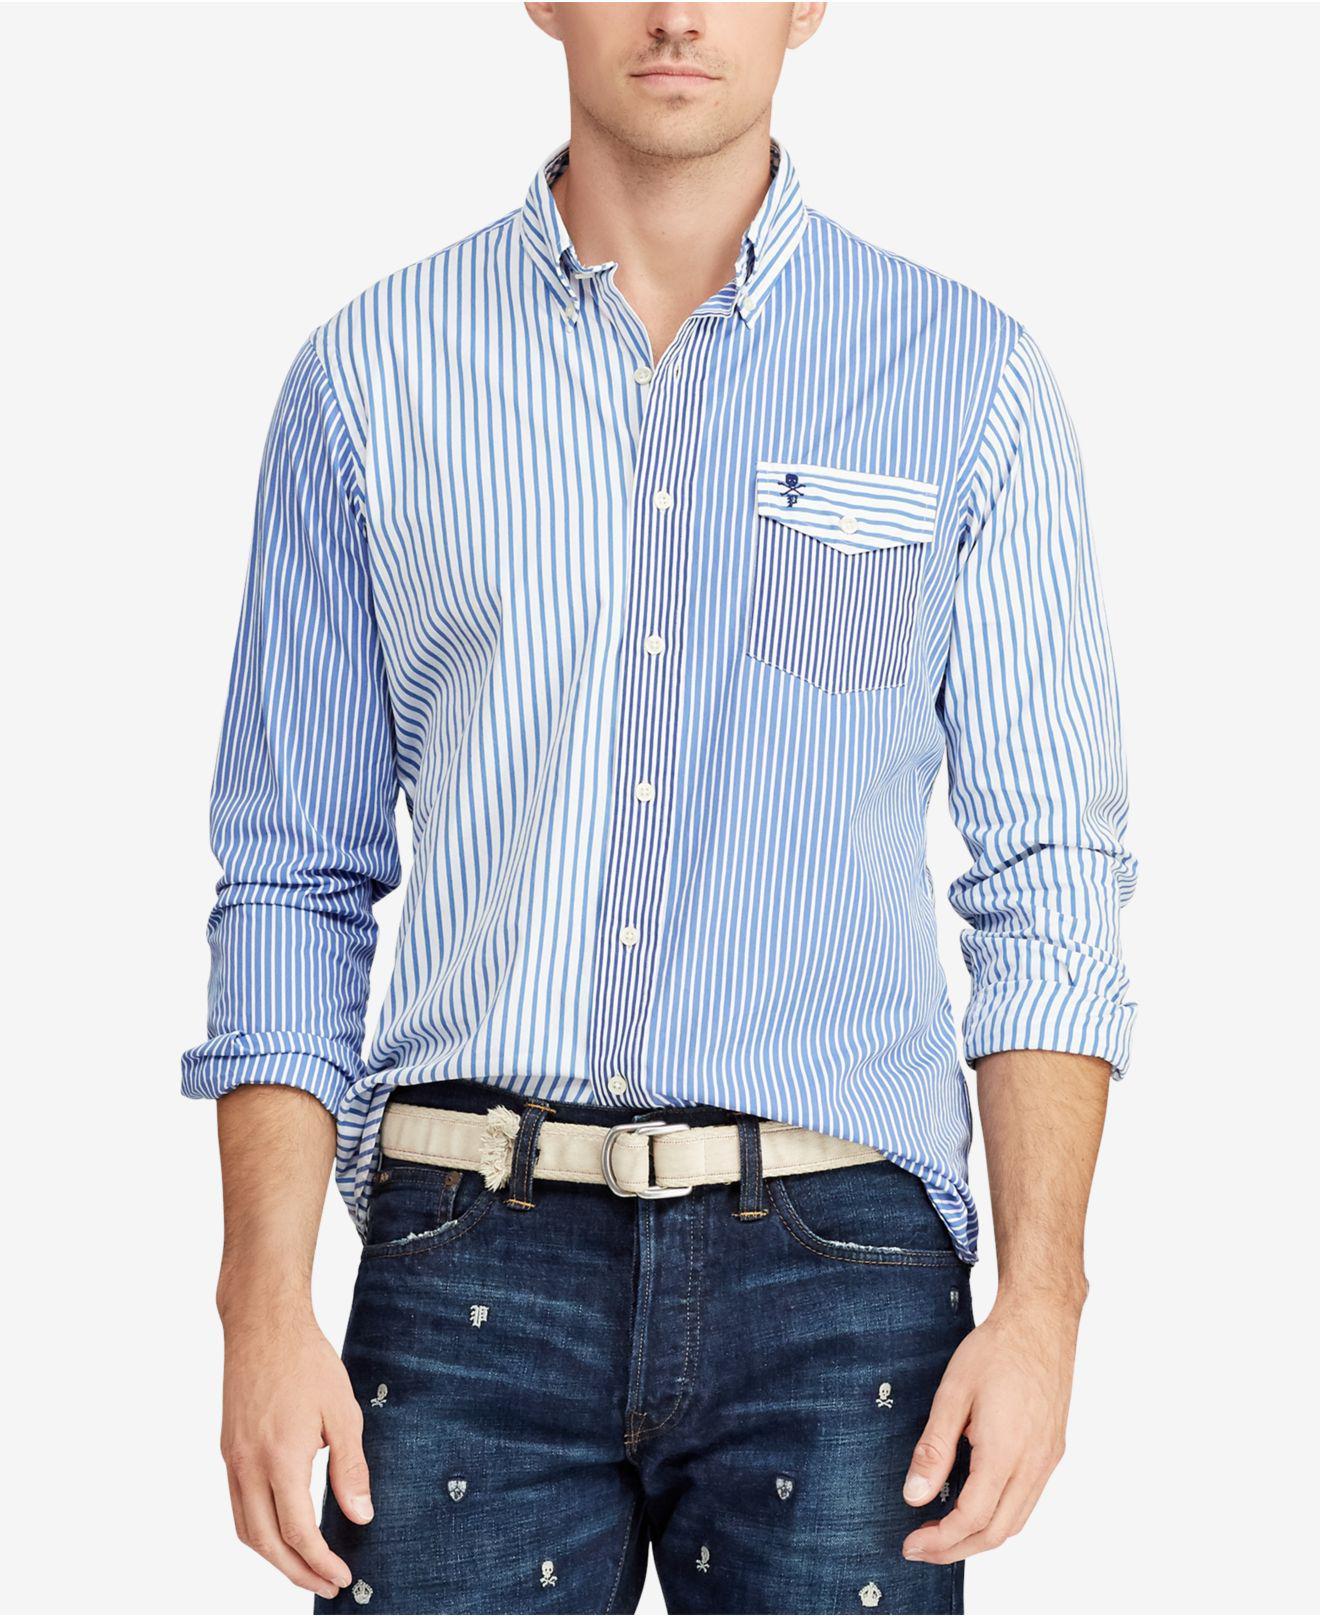 f777c3e7665 Lyst - Polo Ralph Lauren Classic Fit Poplin Shirt in Blue for Men